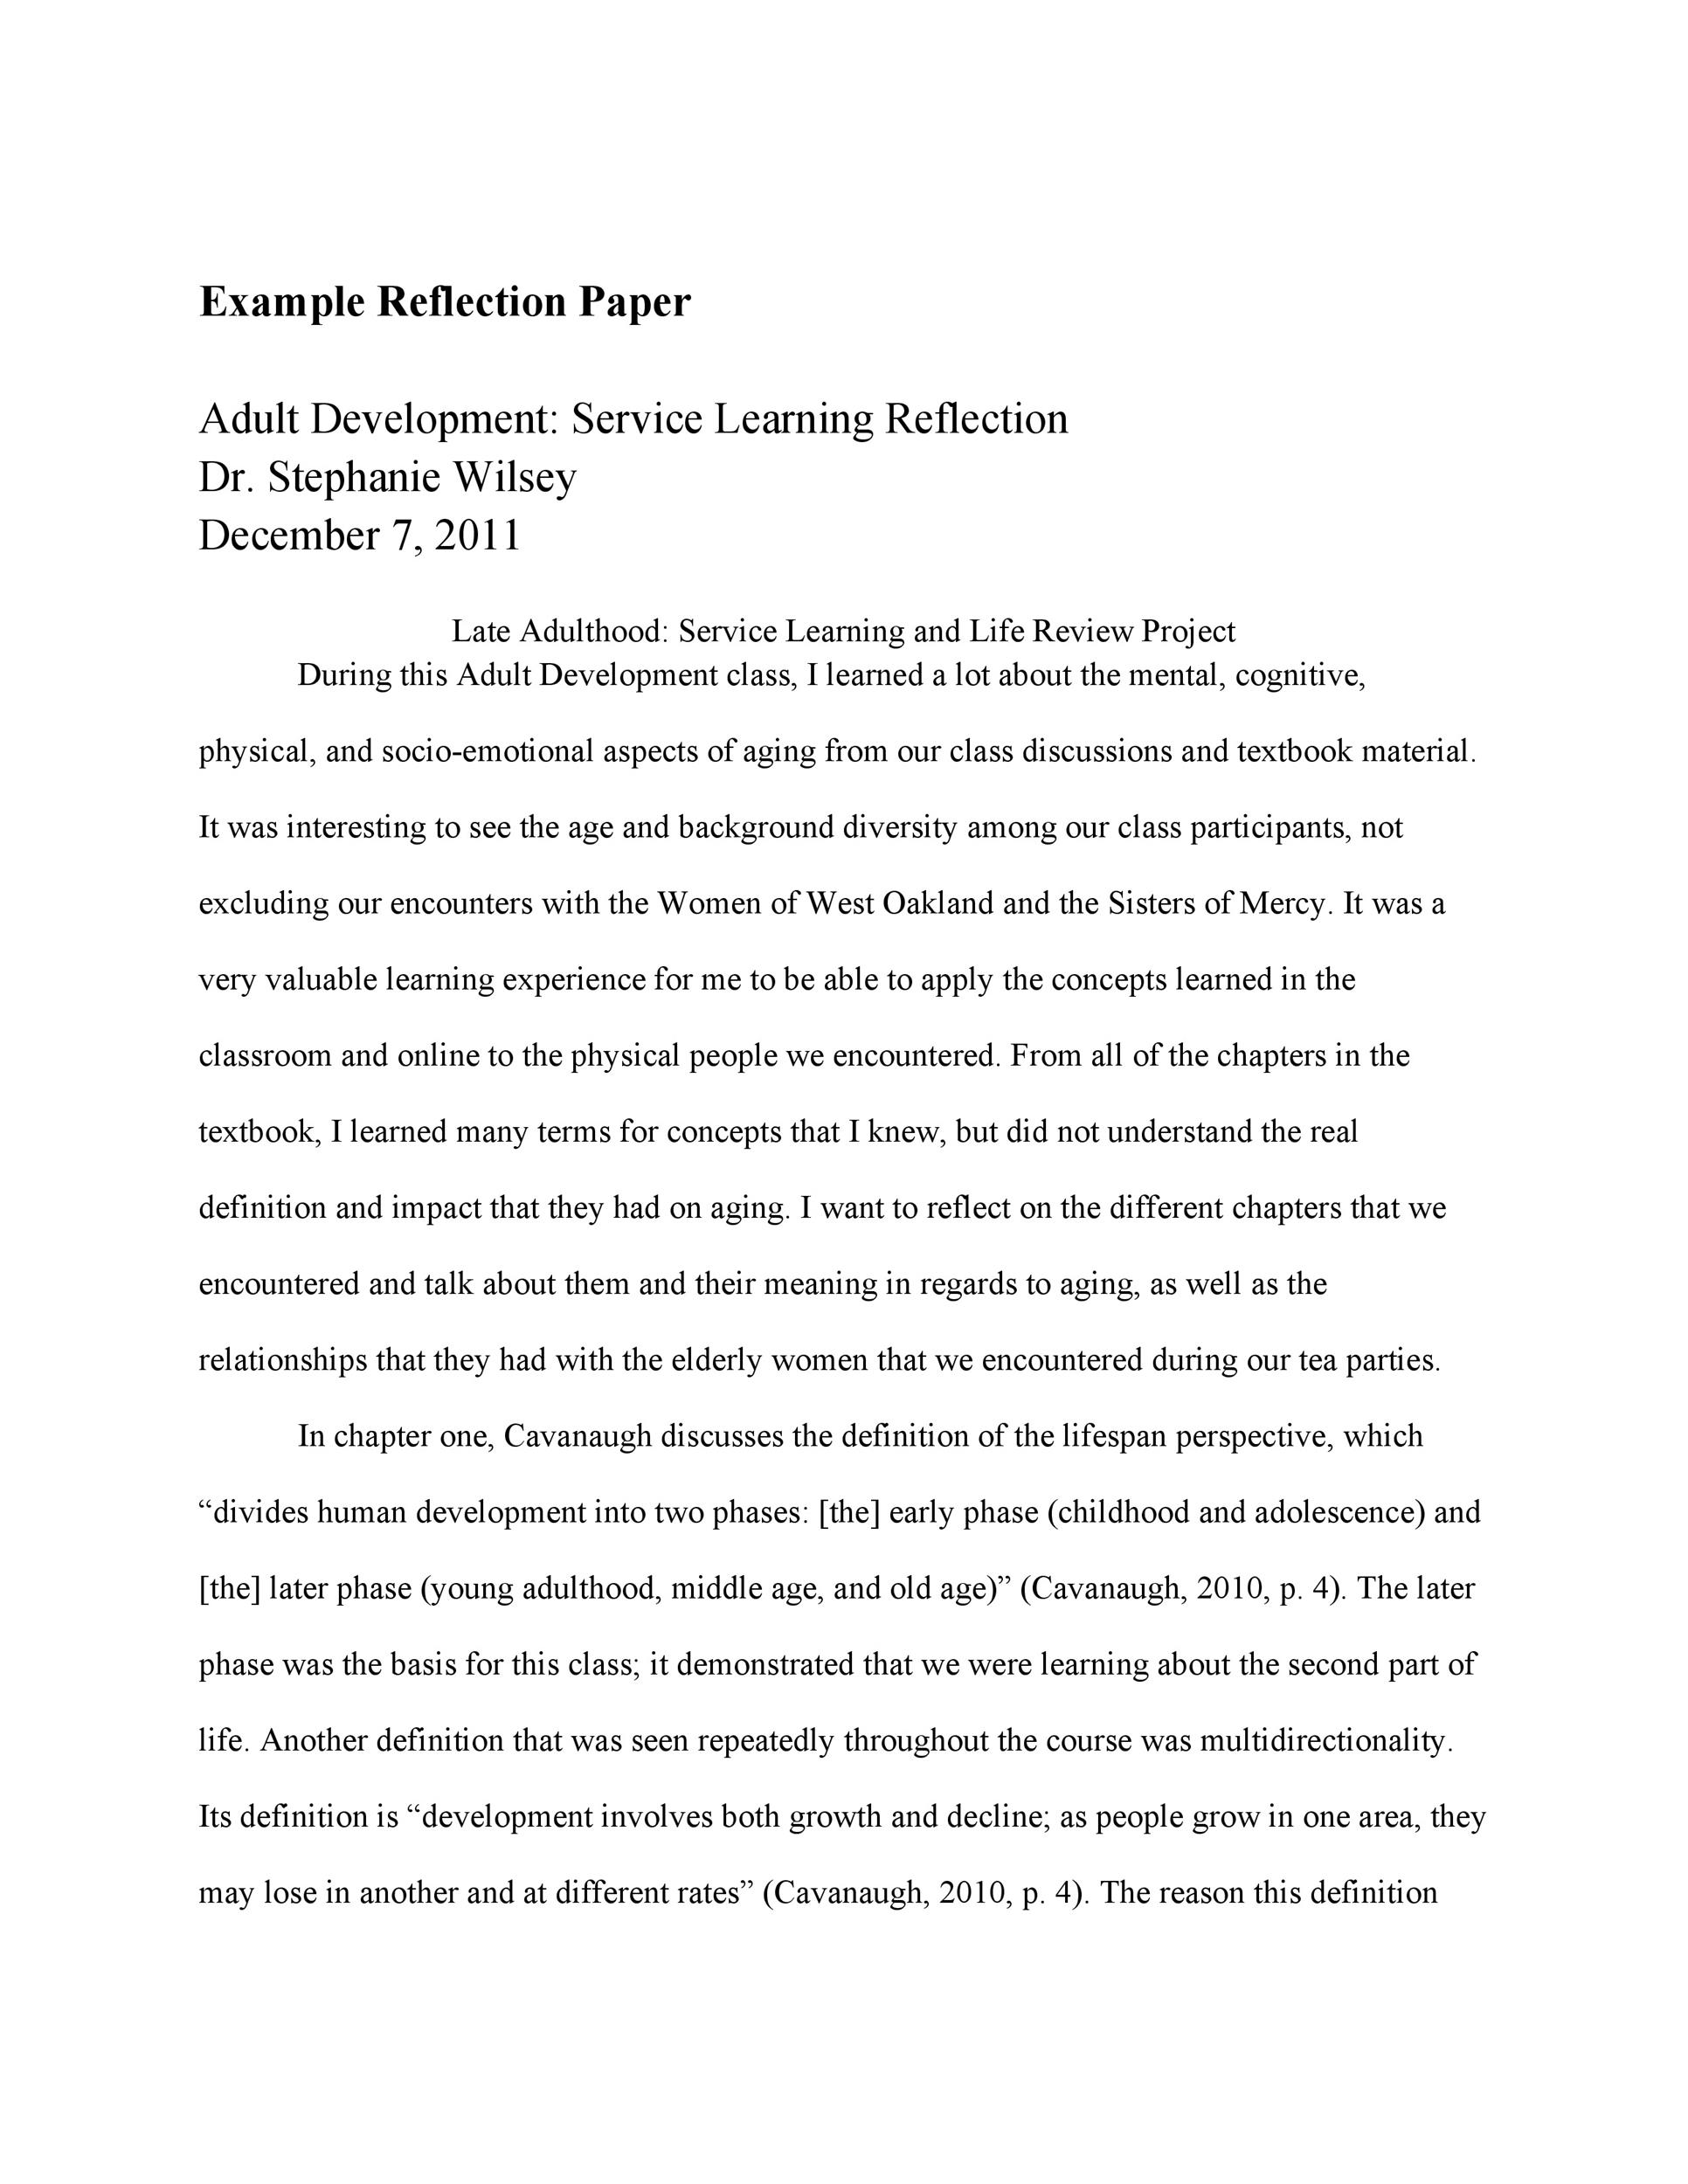 Free reflective essay example 41